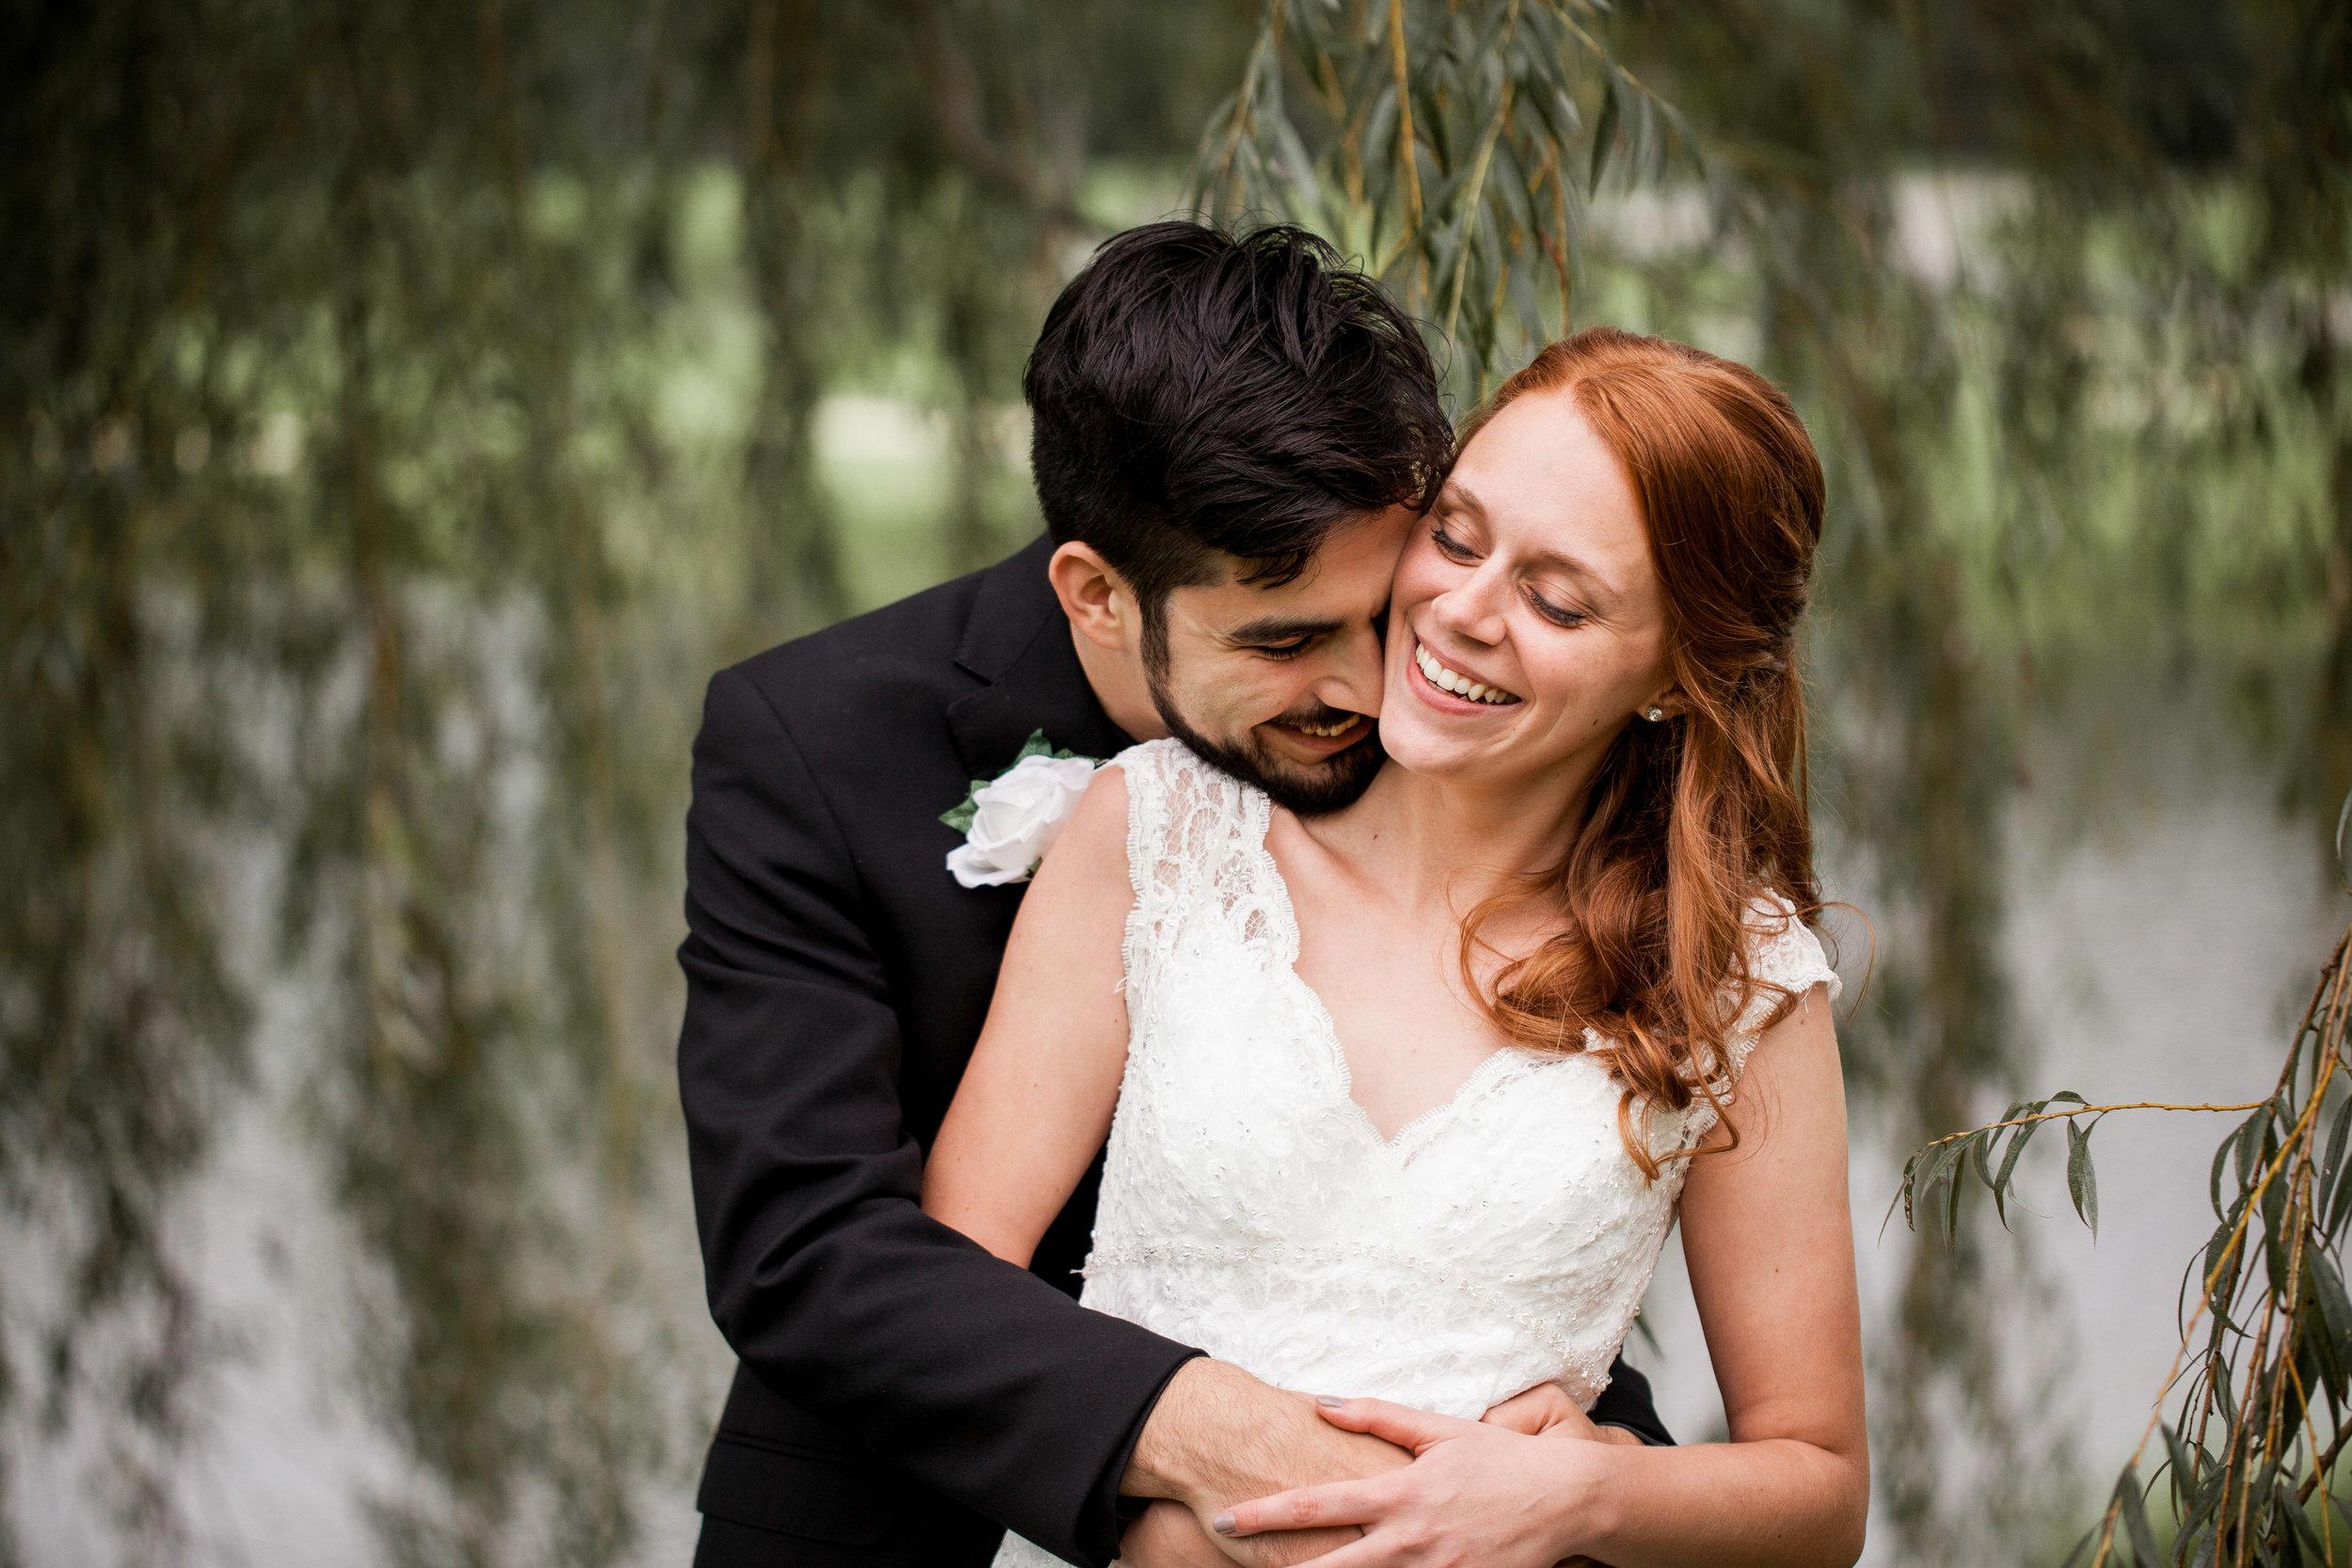 pittsburgh_wedding_photographer_liz_capuano-0938.jpg